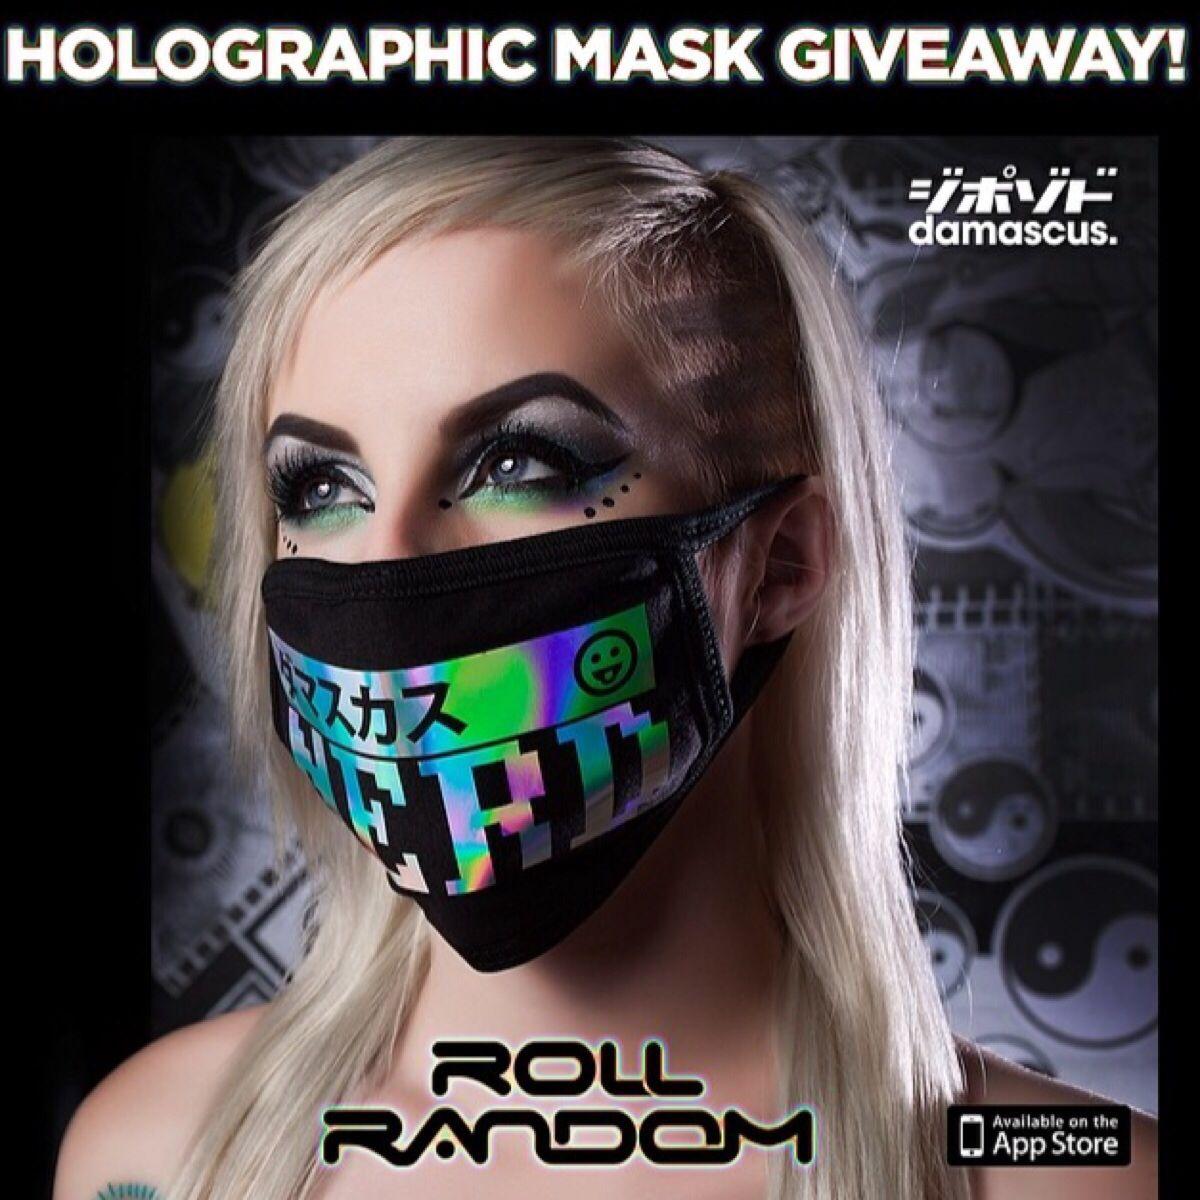 ROLLRANDOM_APP & DamascusApparel 4 Holographic Mask